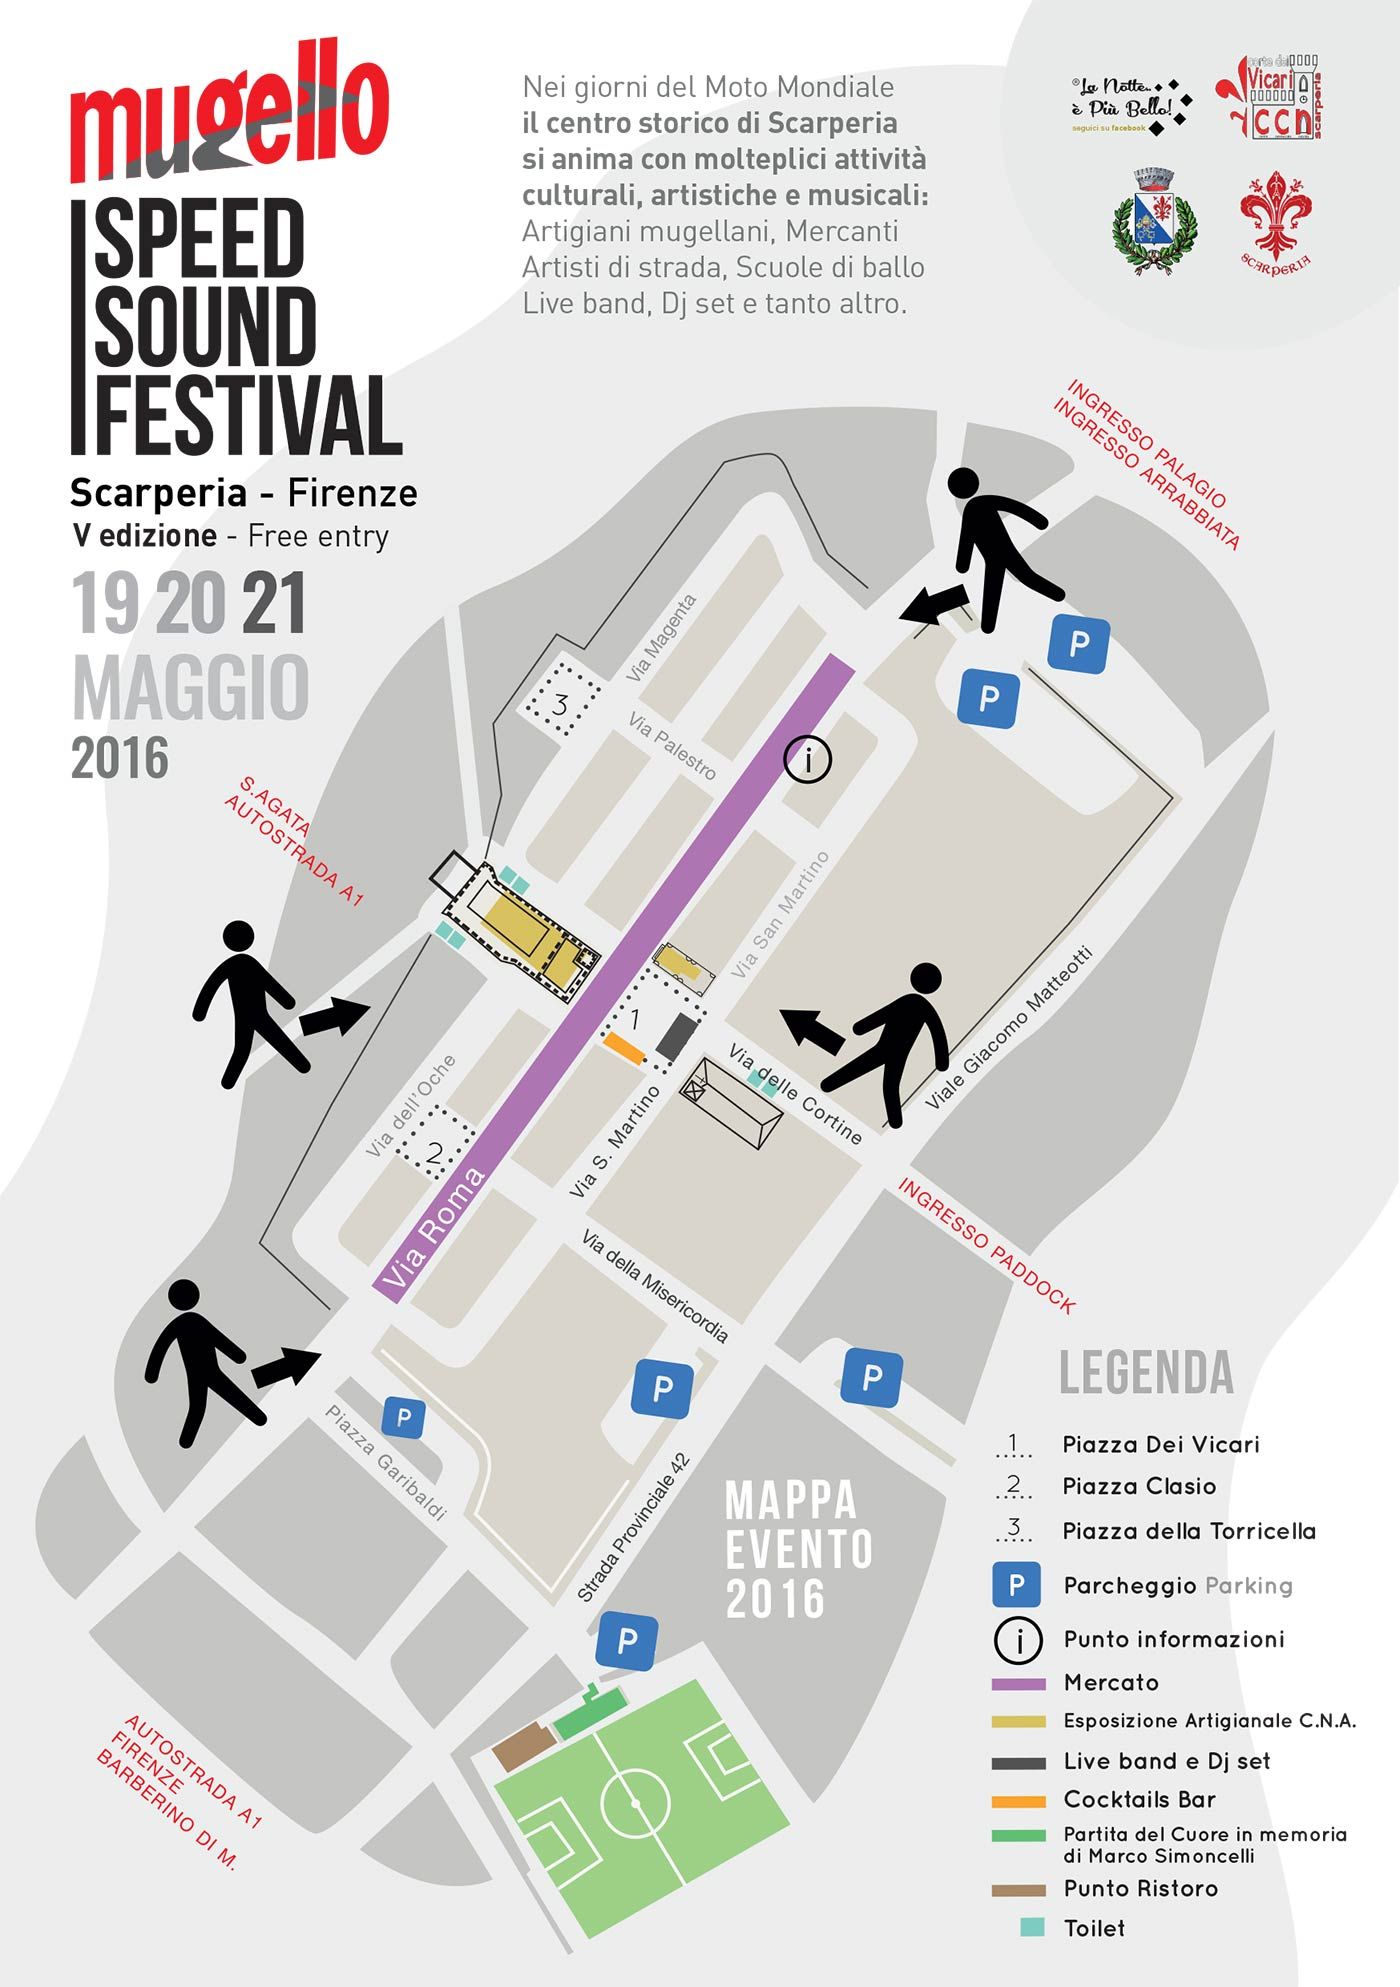 programma-mugello-speed-sound-festival-2016-1